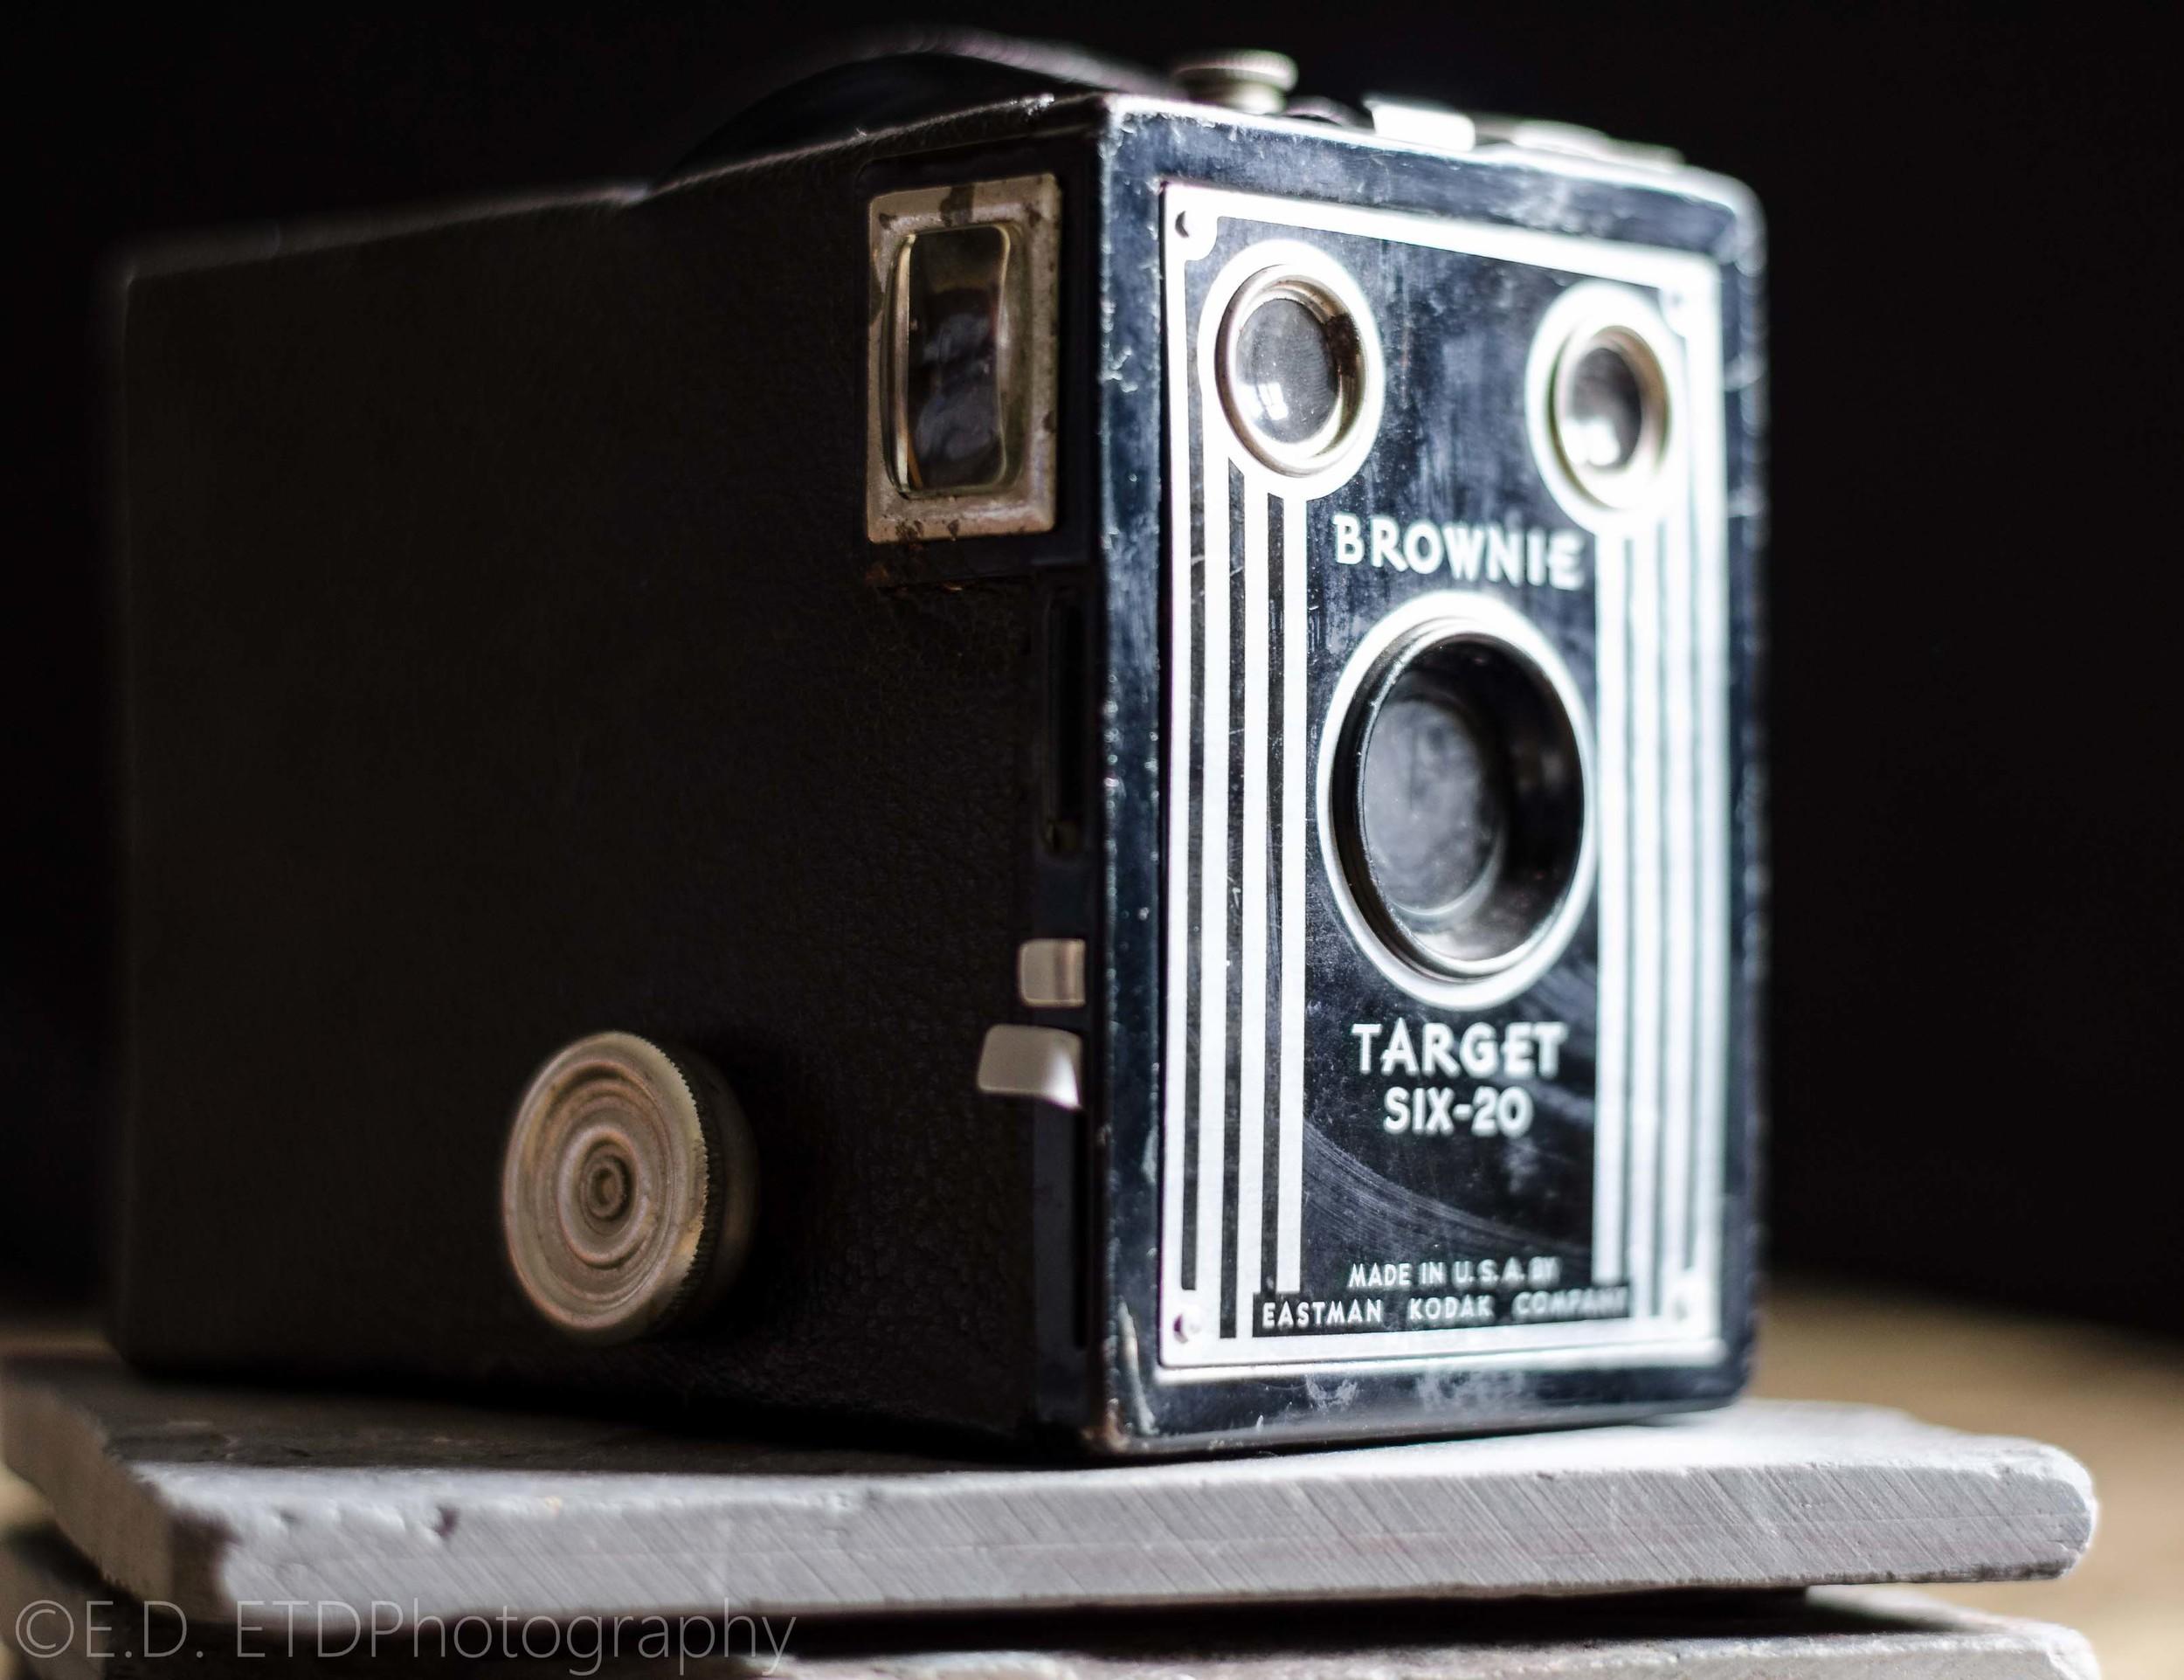 Brownie Target Six-20 Box Camera